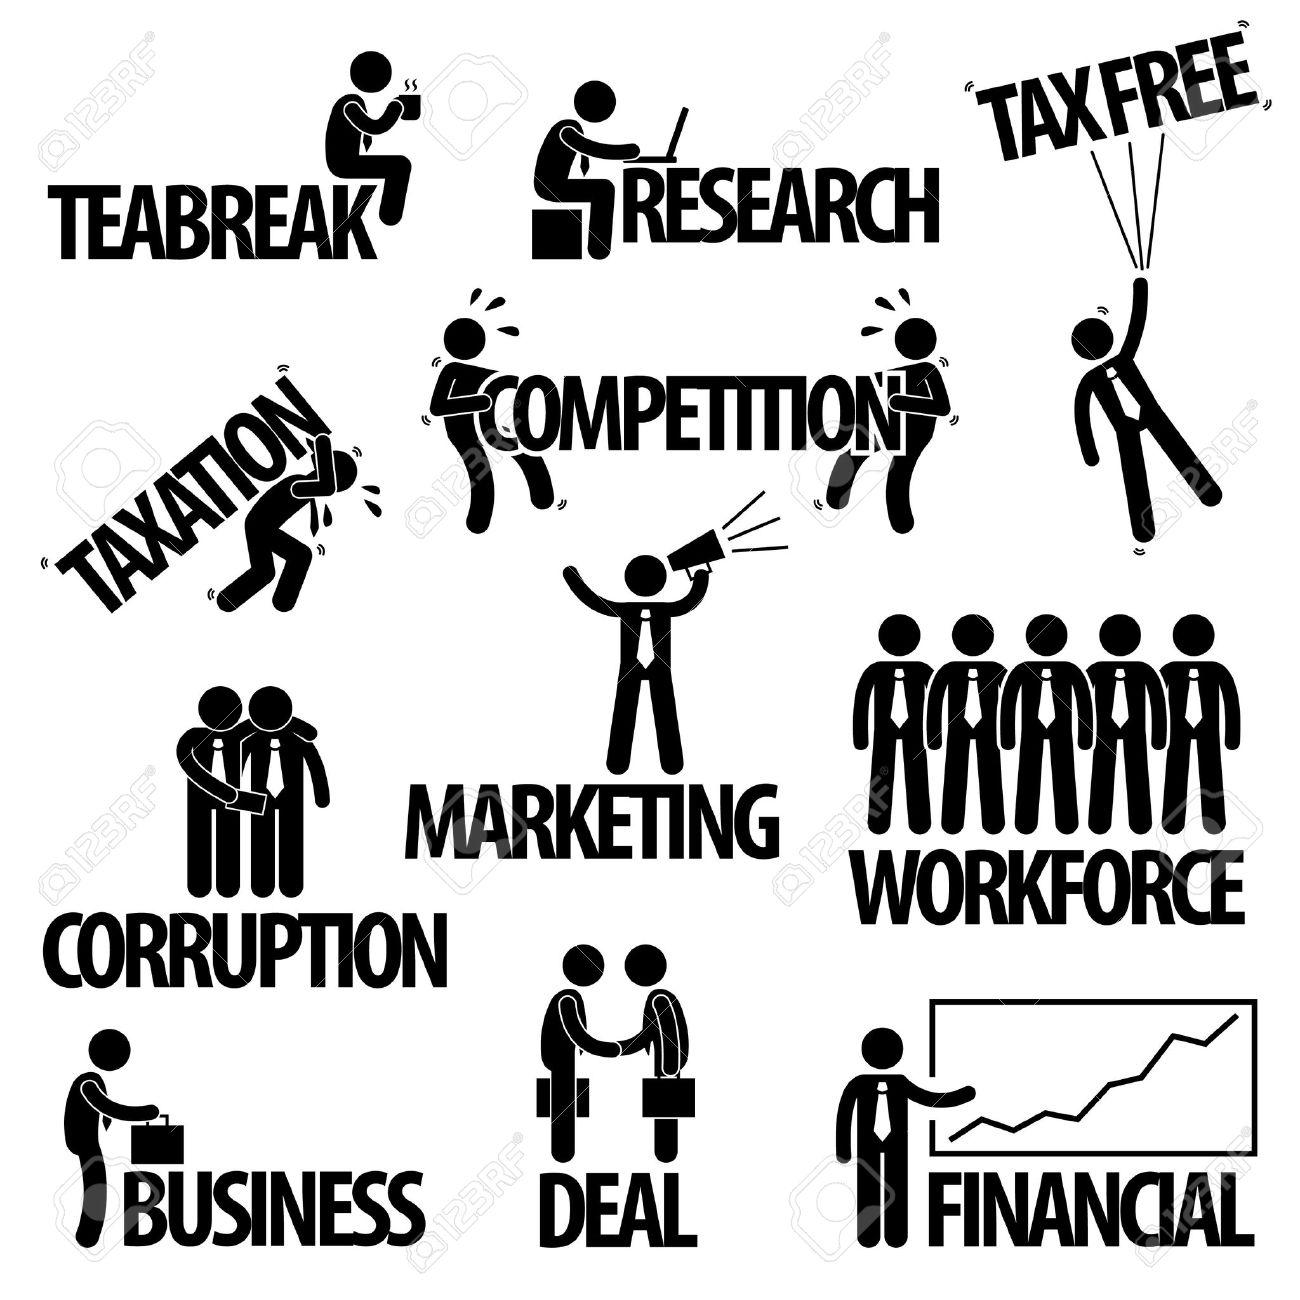 Business Finance Businessman Entrepreneur Employee Worker Team Text Word Stick Figure Pictogram Icon Stock Vector - 19686425